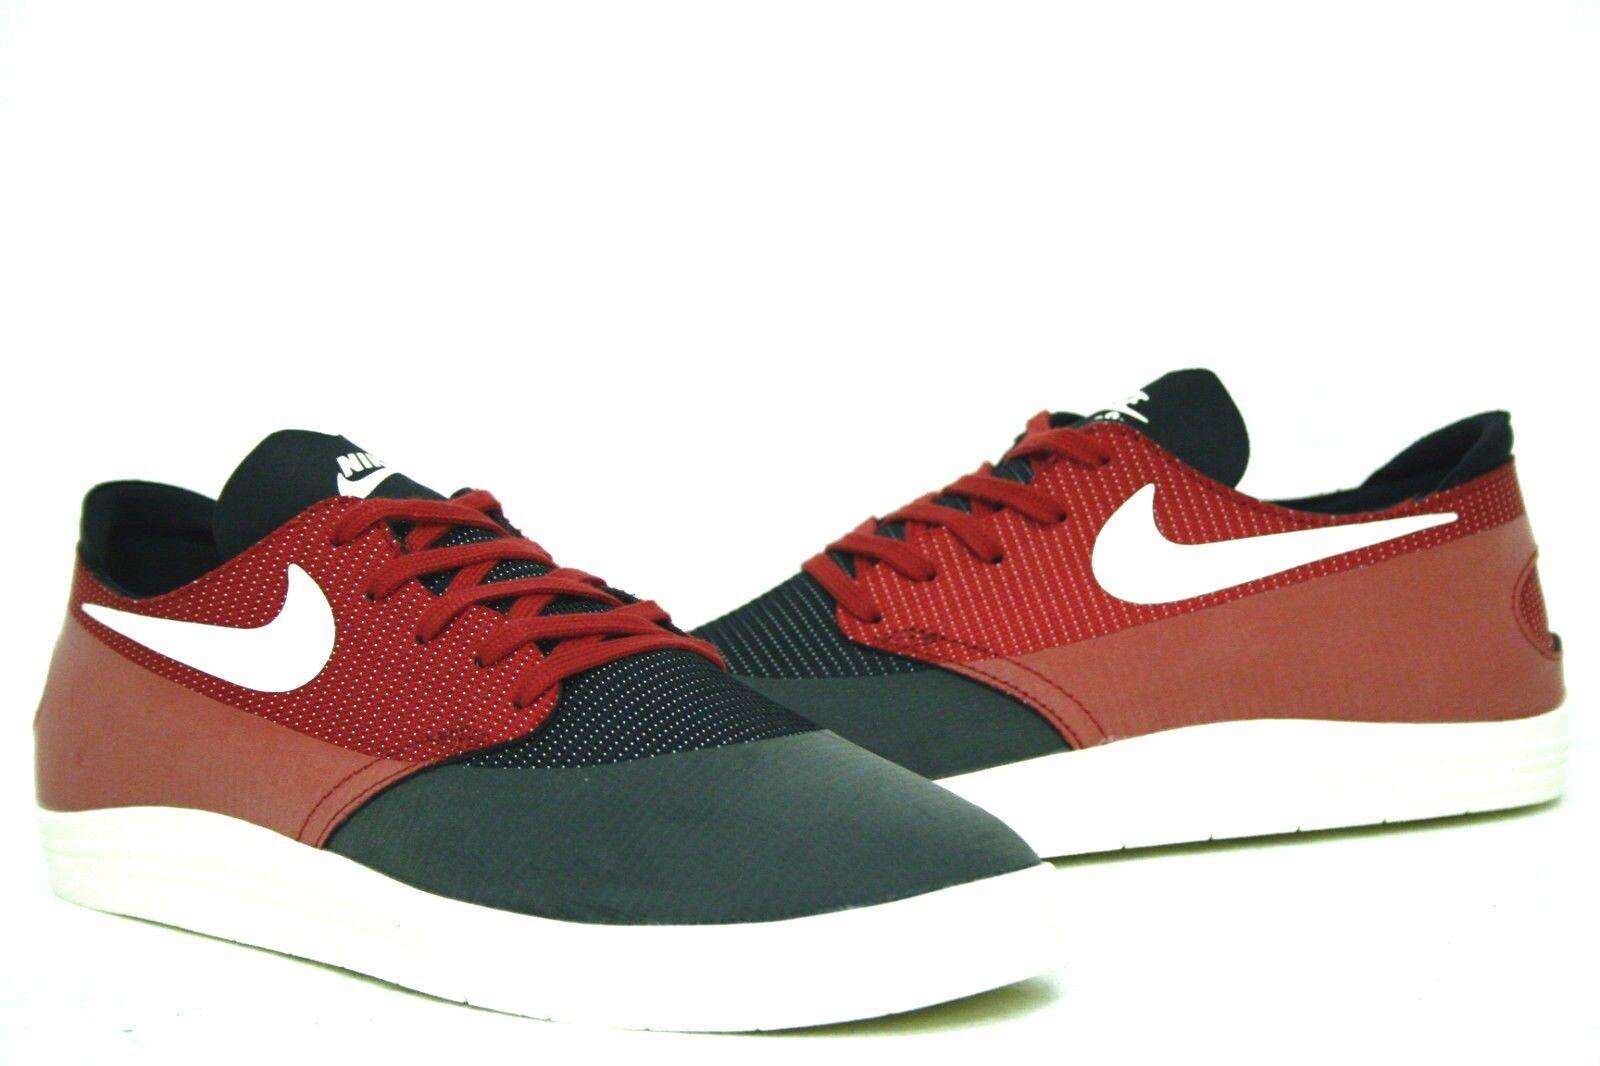 Nike SB Lunar OneShot  Shoes 631044-006 US Pair Mens Size 9 Last Pair US 92e67e